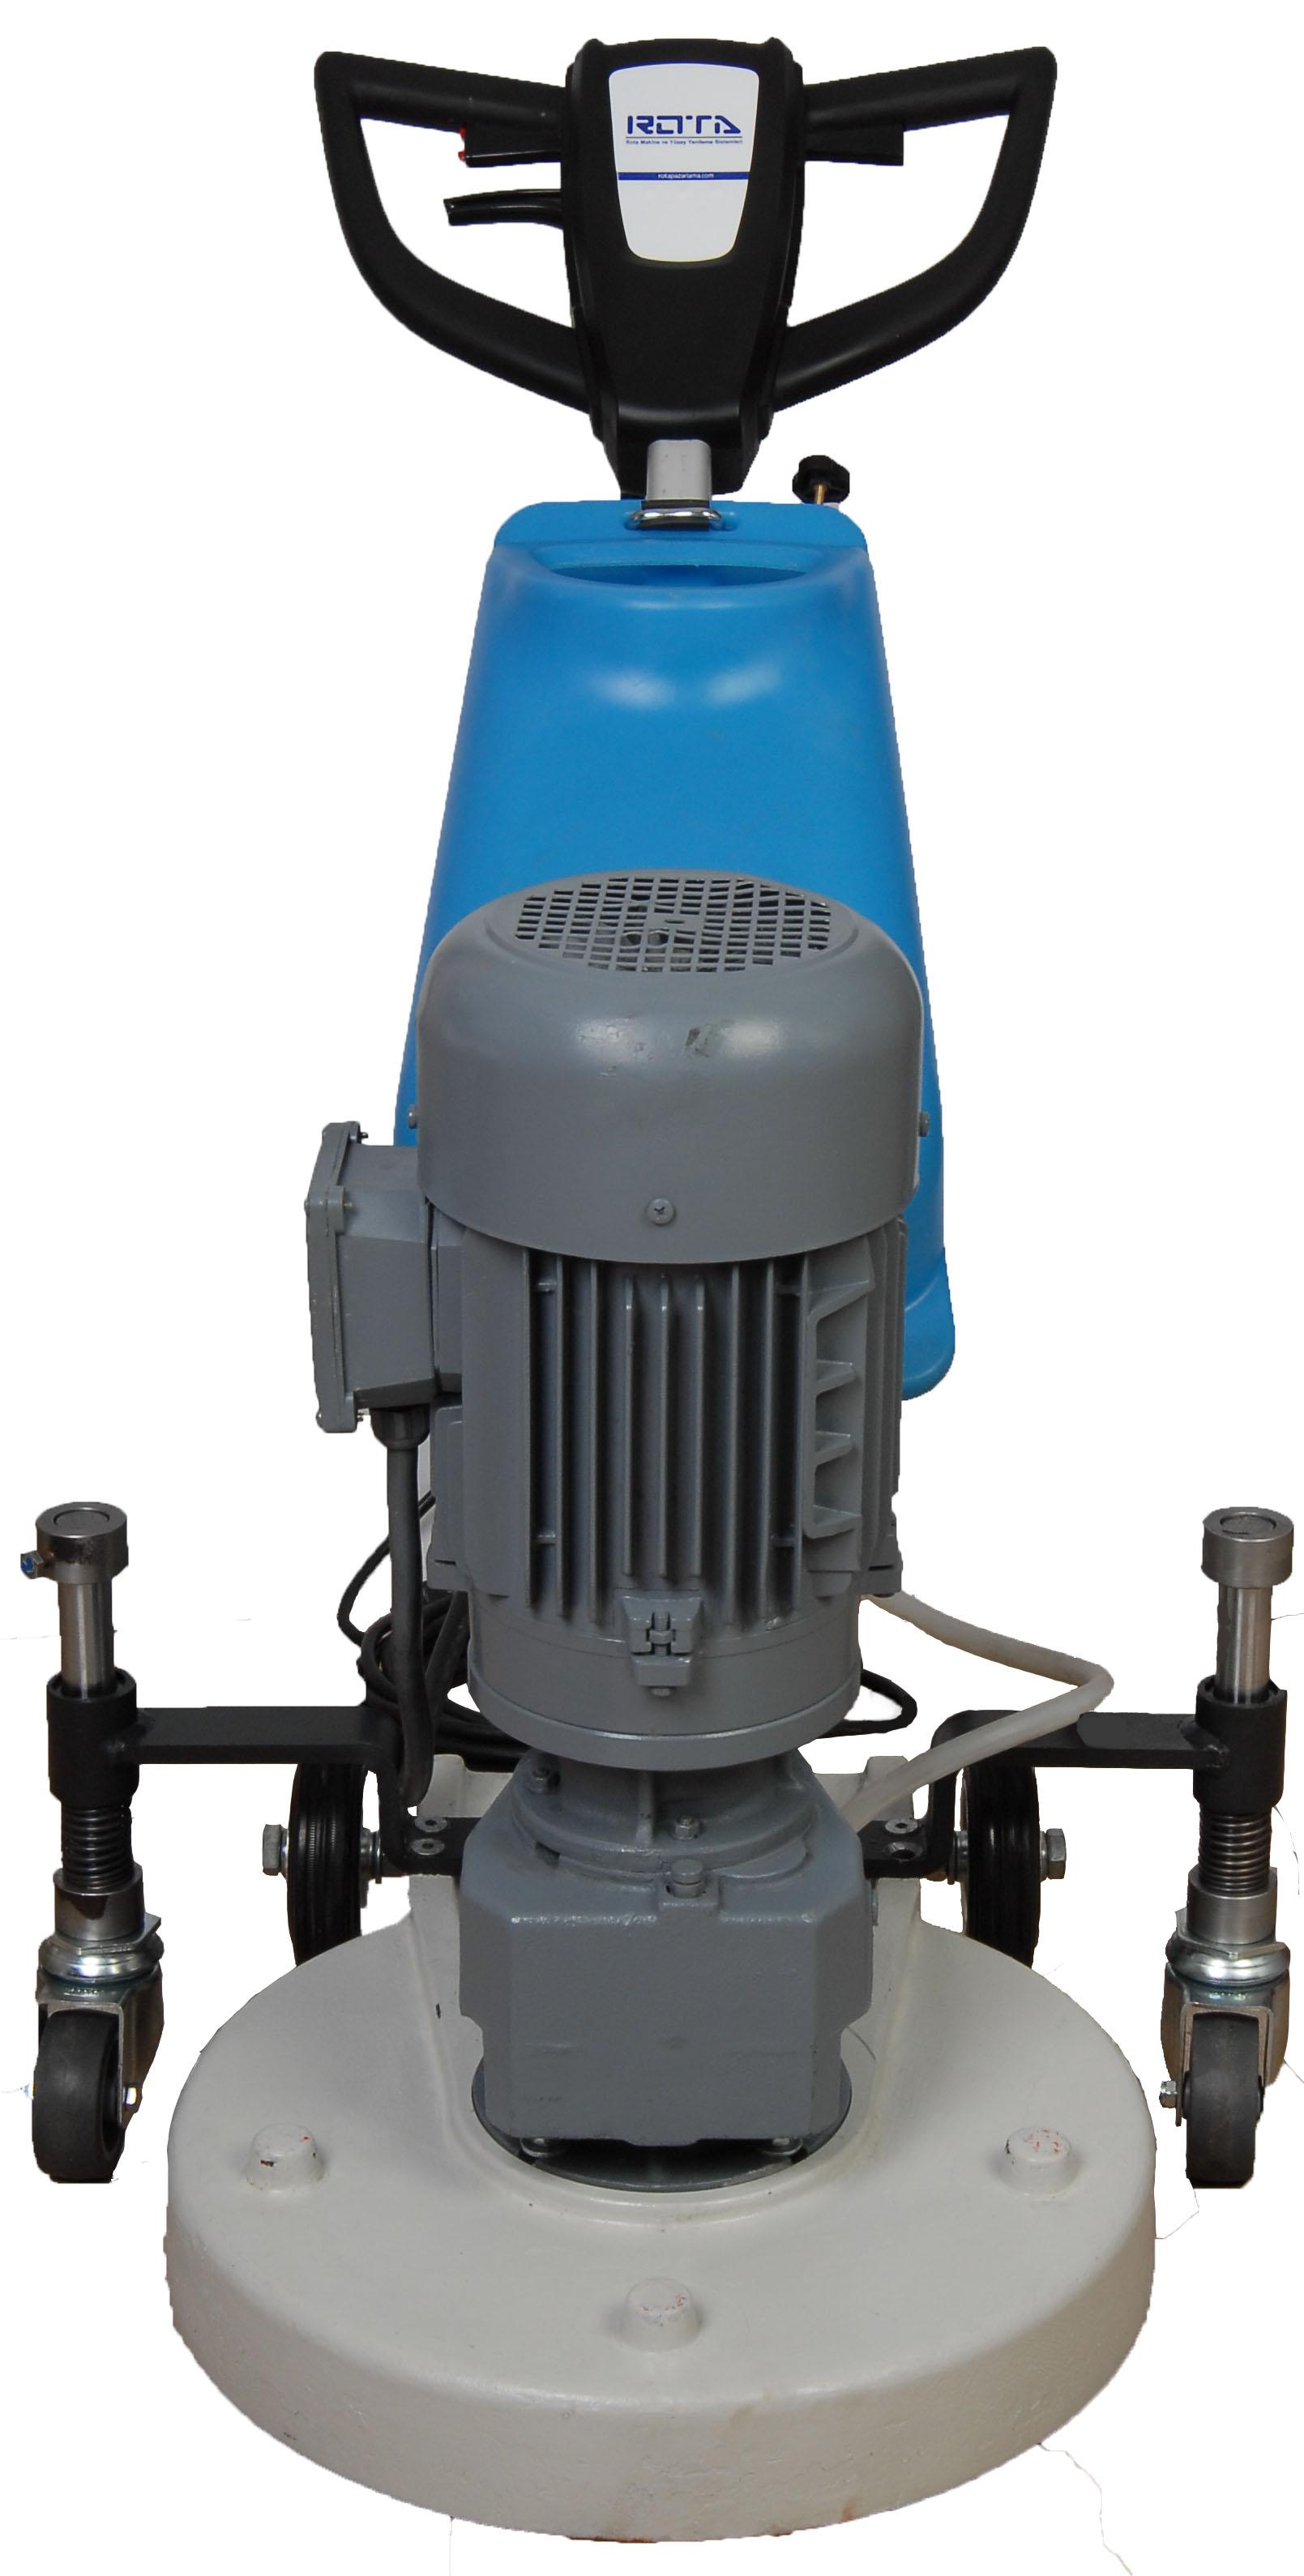 mermer-cilalama-makinesi